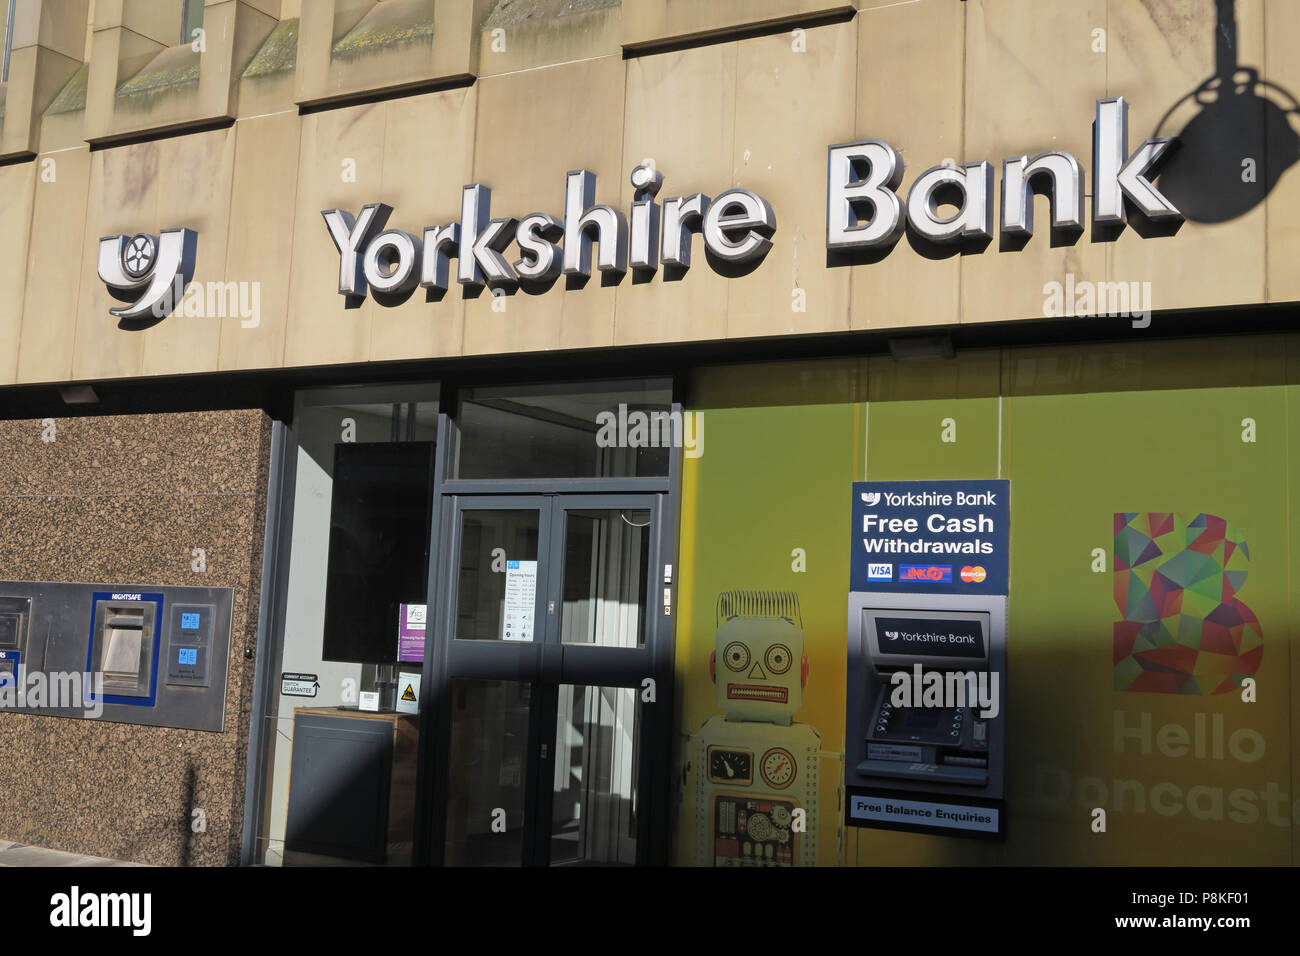 @HotpixUK,GoTonySmith,Doncaster,South Yorkshire,England,Donny,Doncaster Yorkshire,town,town centre,shop,shops,retail,Doncaster Town Centre,Danum,Roman Danum,DN1,DN1 Postcode,banking,retail banking,UK,DN1 1SJ,branch,bank,closure,programme,program,Colonel Edward Akroyd,National Australia Bank Group,Yorkshire and Clydesdale Banks,Virgin Money brand,Virgin Money,brand